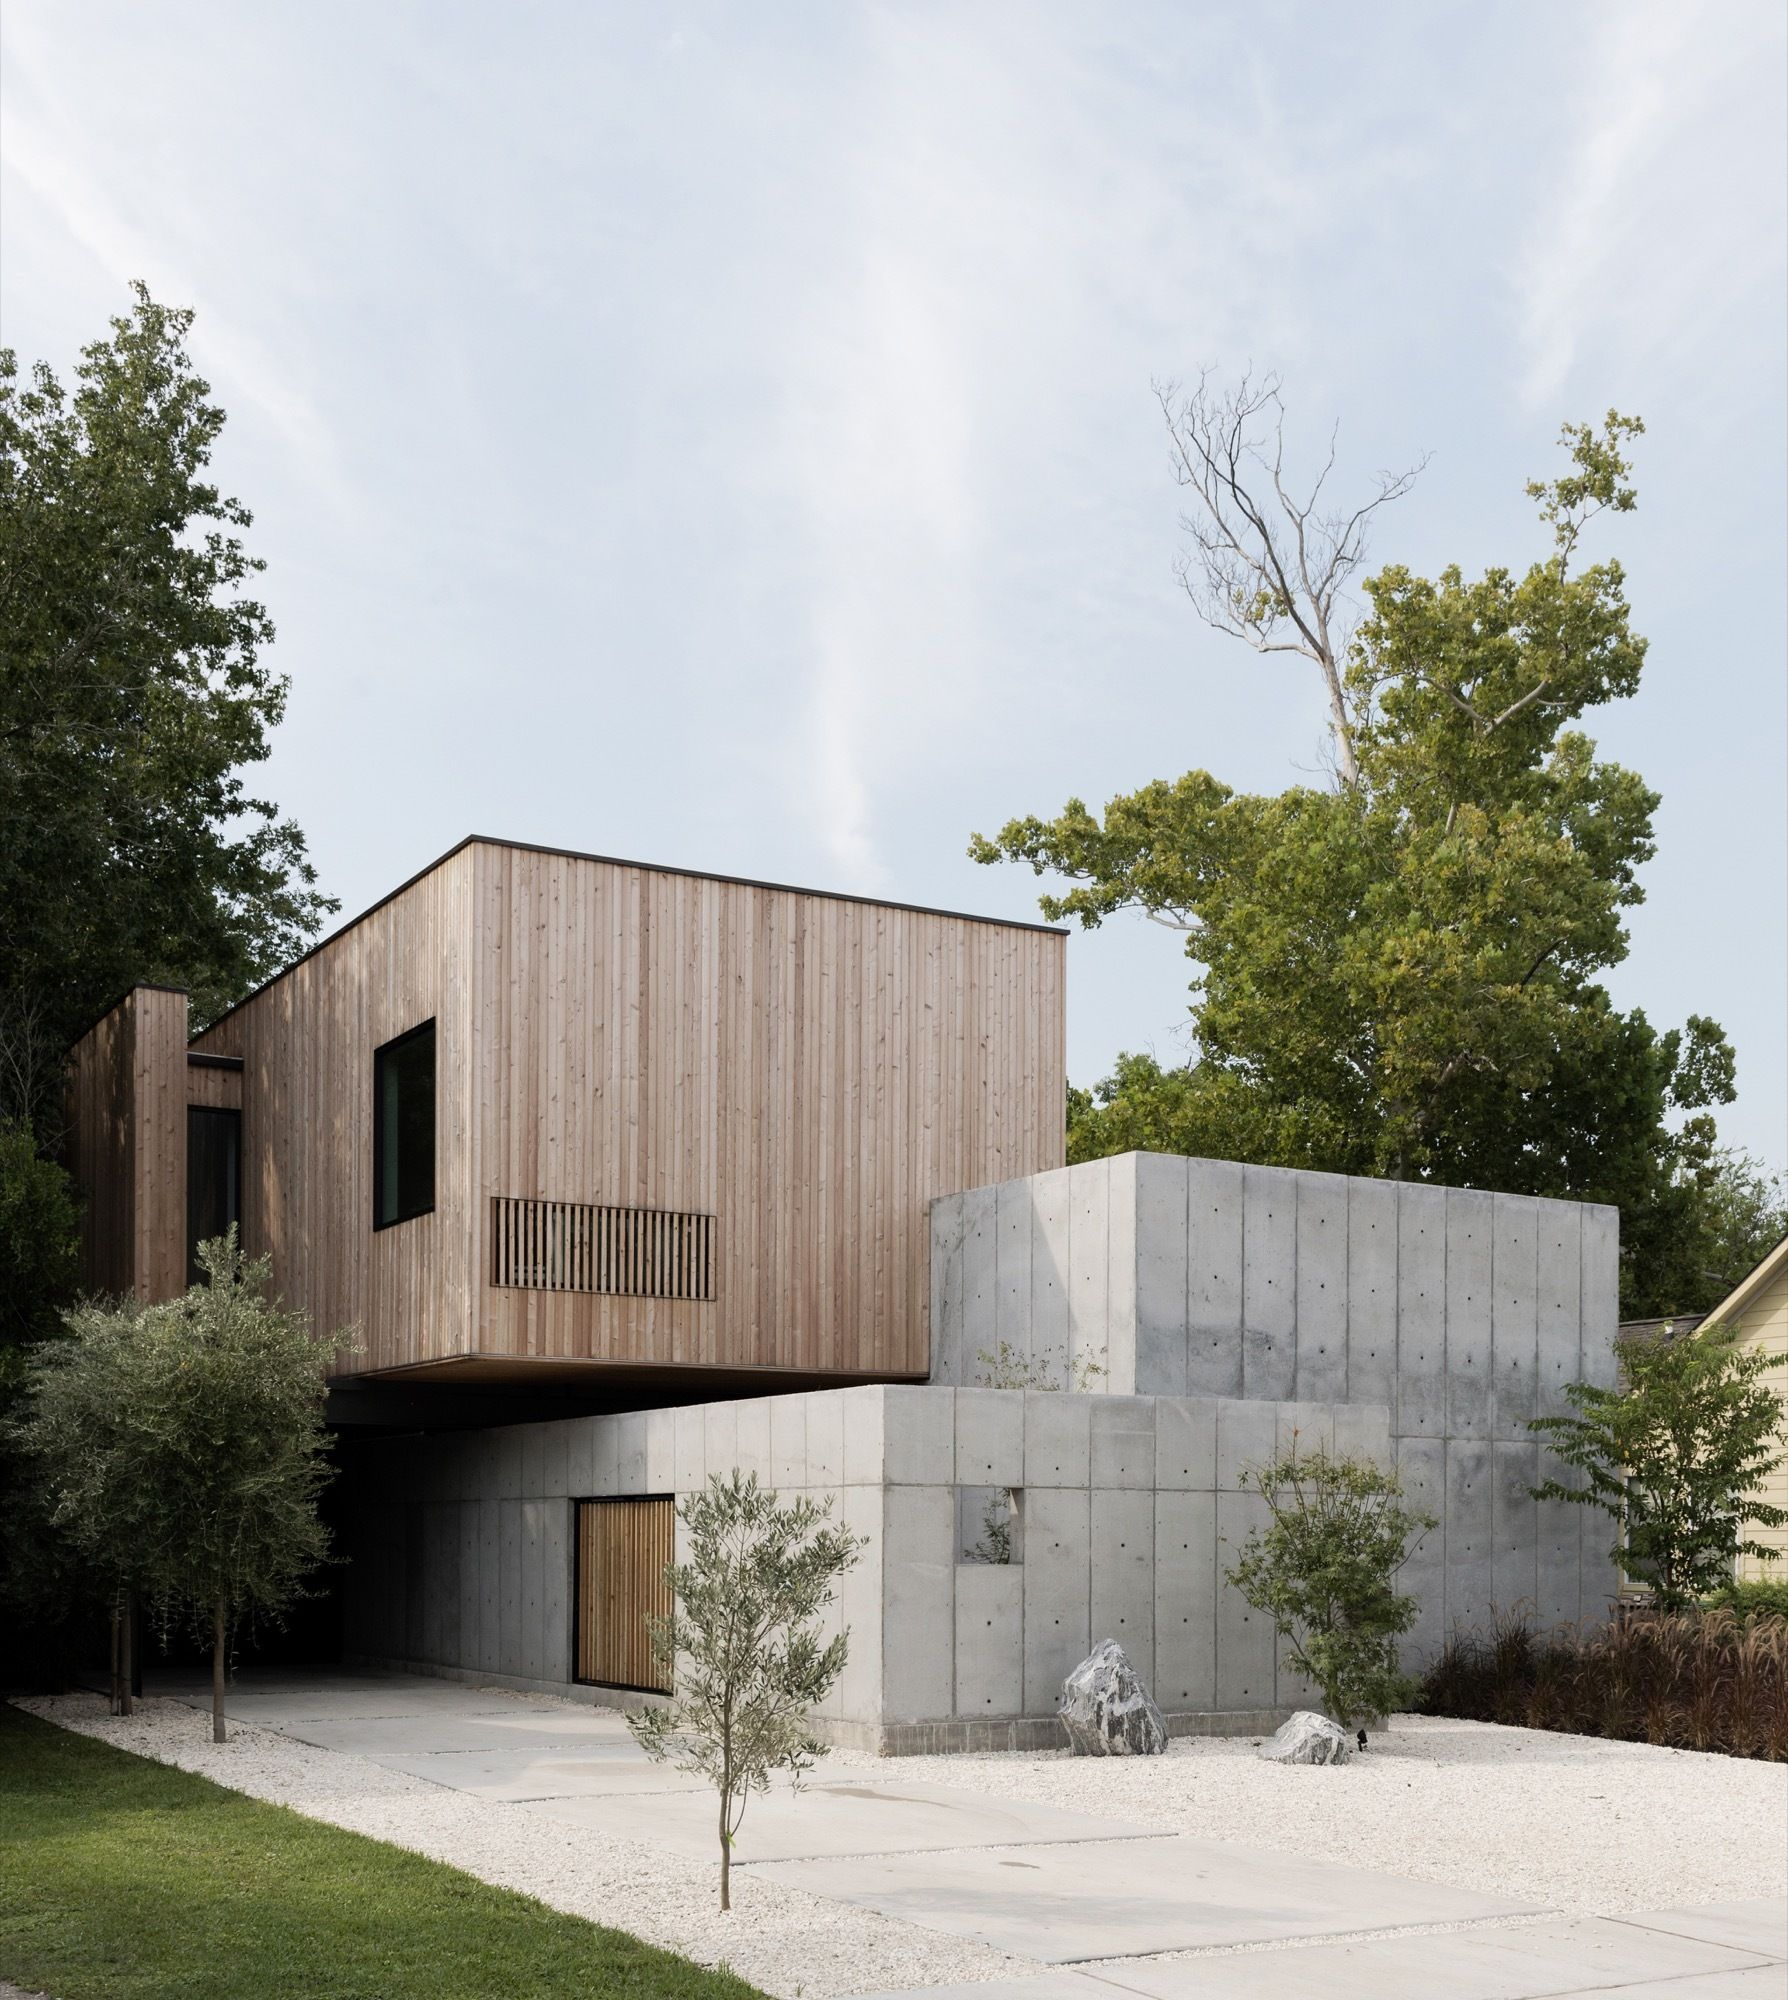 Gallery of Concrete Box House / Robertson Design - 6 | Pinterest ...